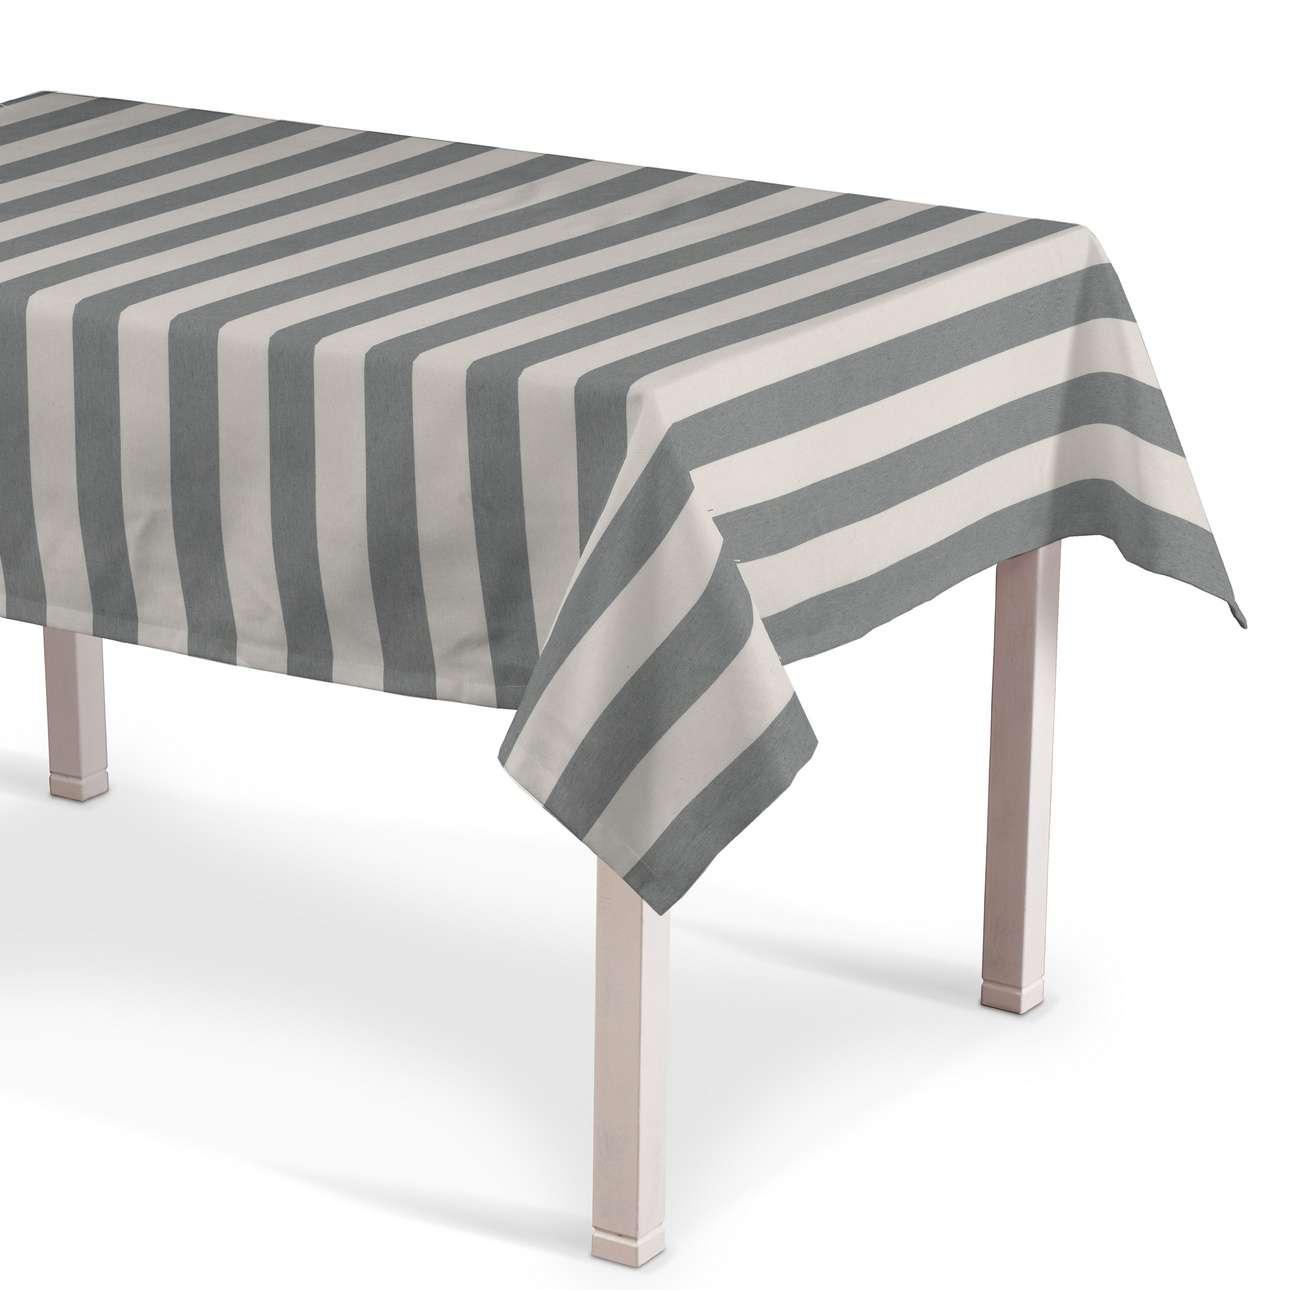 Rektangulære borddug fra kollektionen Quadro II, Stof: 142-71